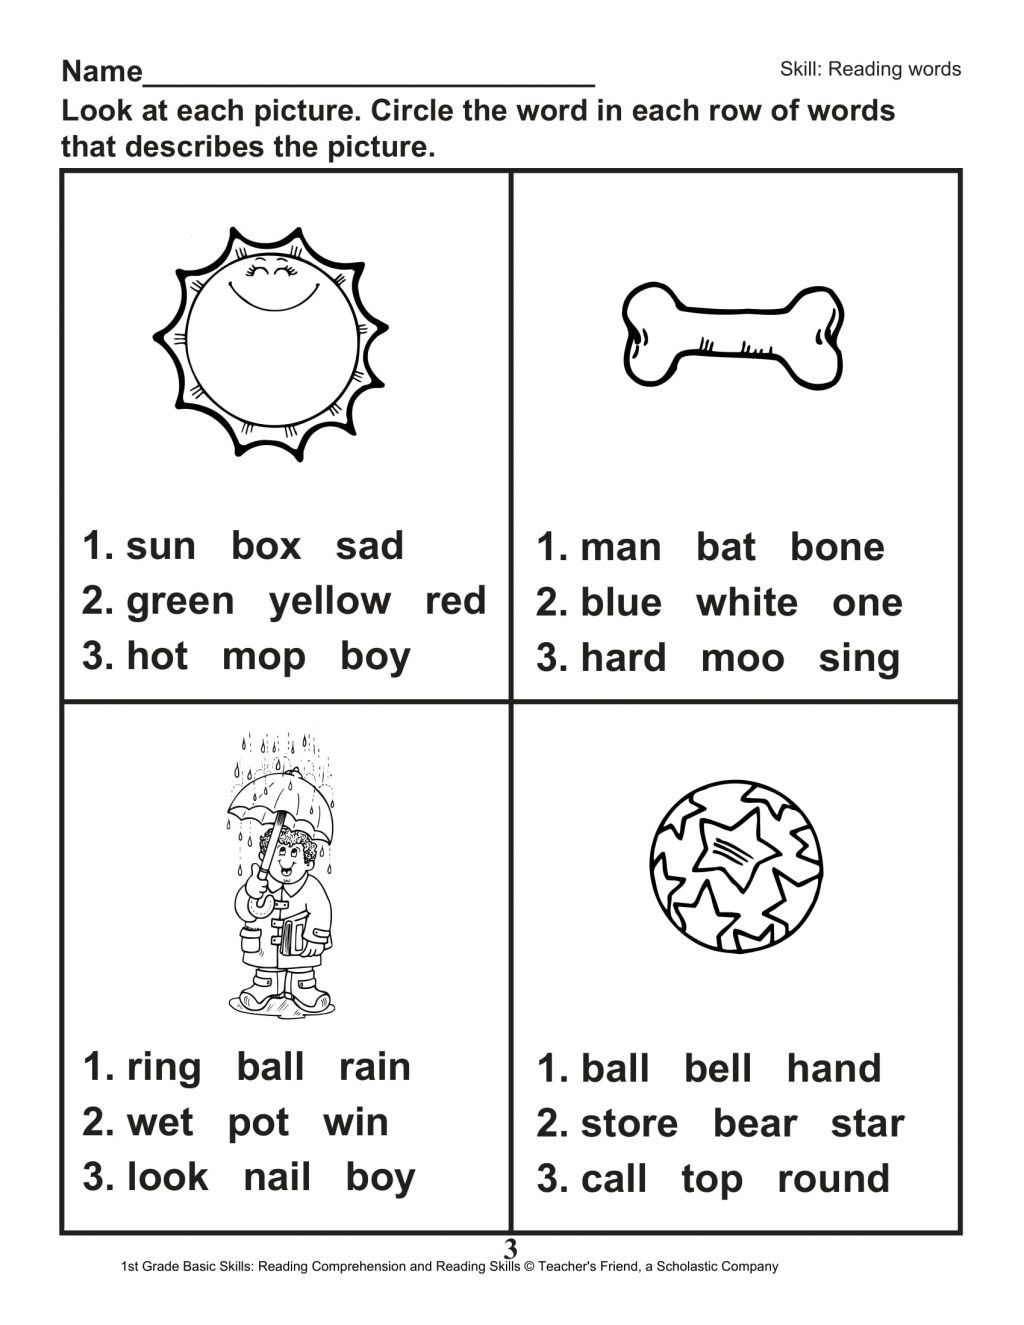 Second Grade Phonics Worksheets In 2020 1st Grade Reading Worksheets Phonics Worksheets First Grade Reading Comprehension